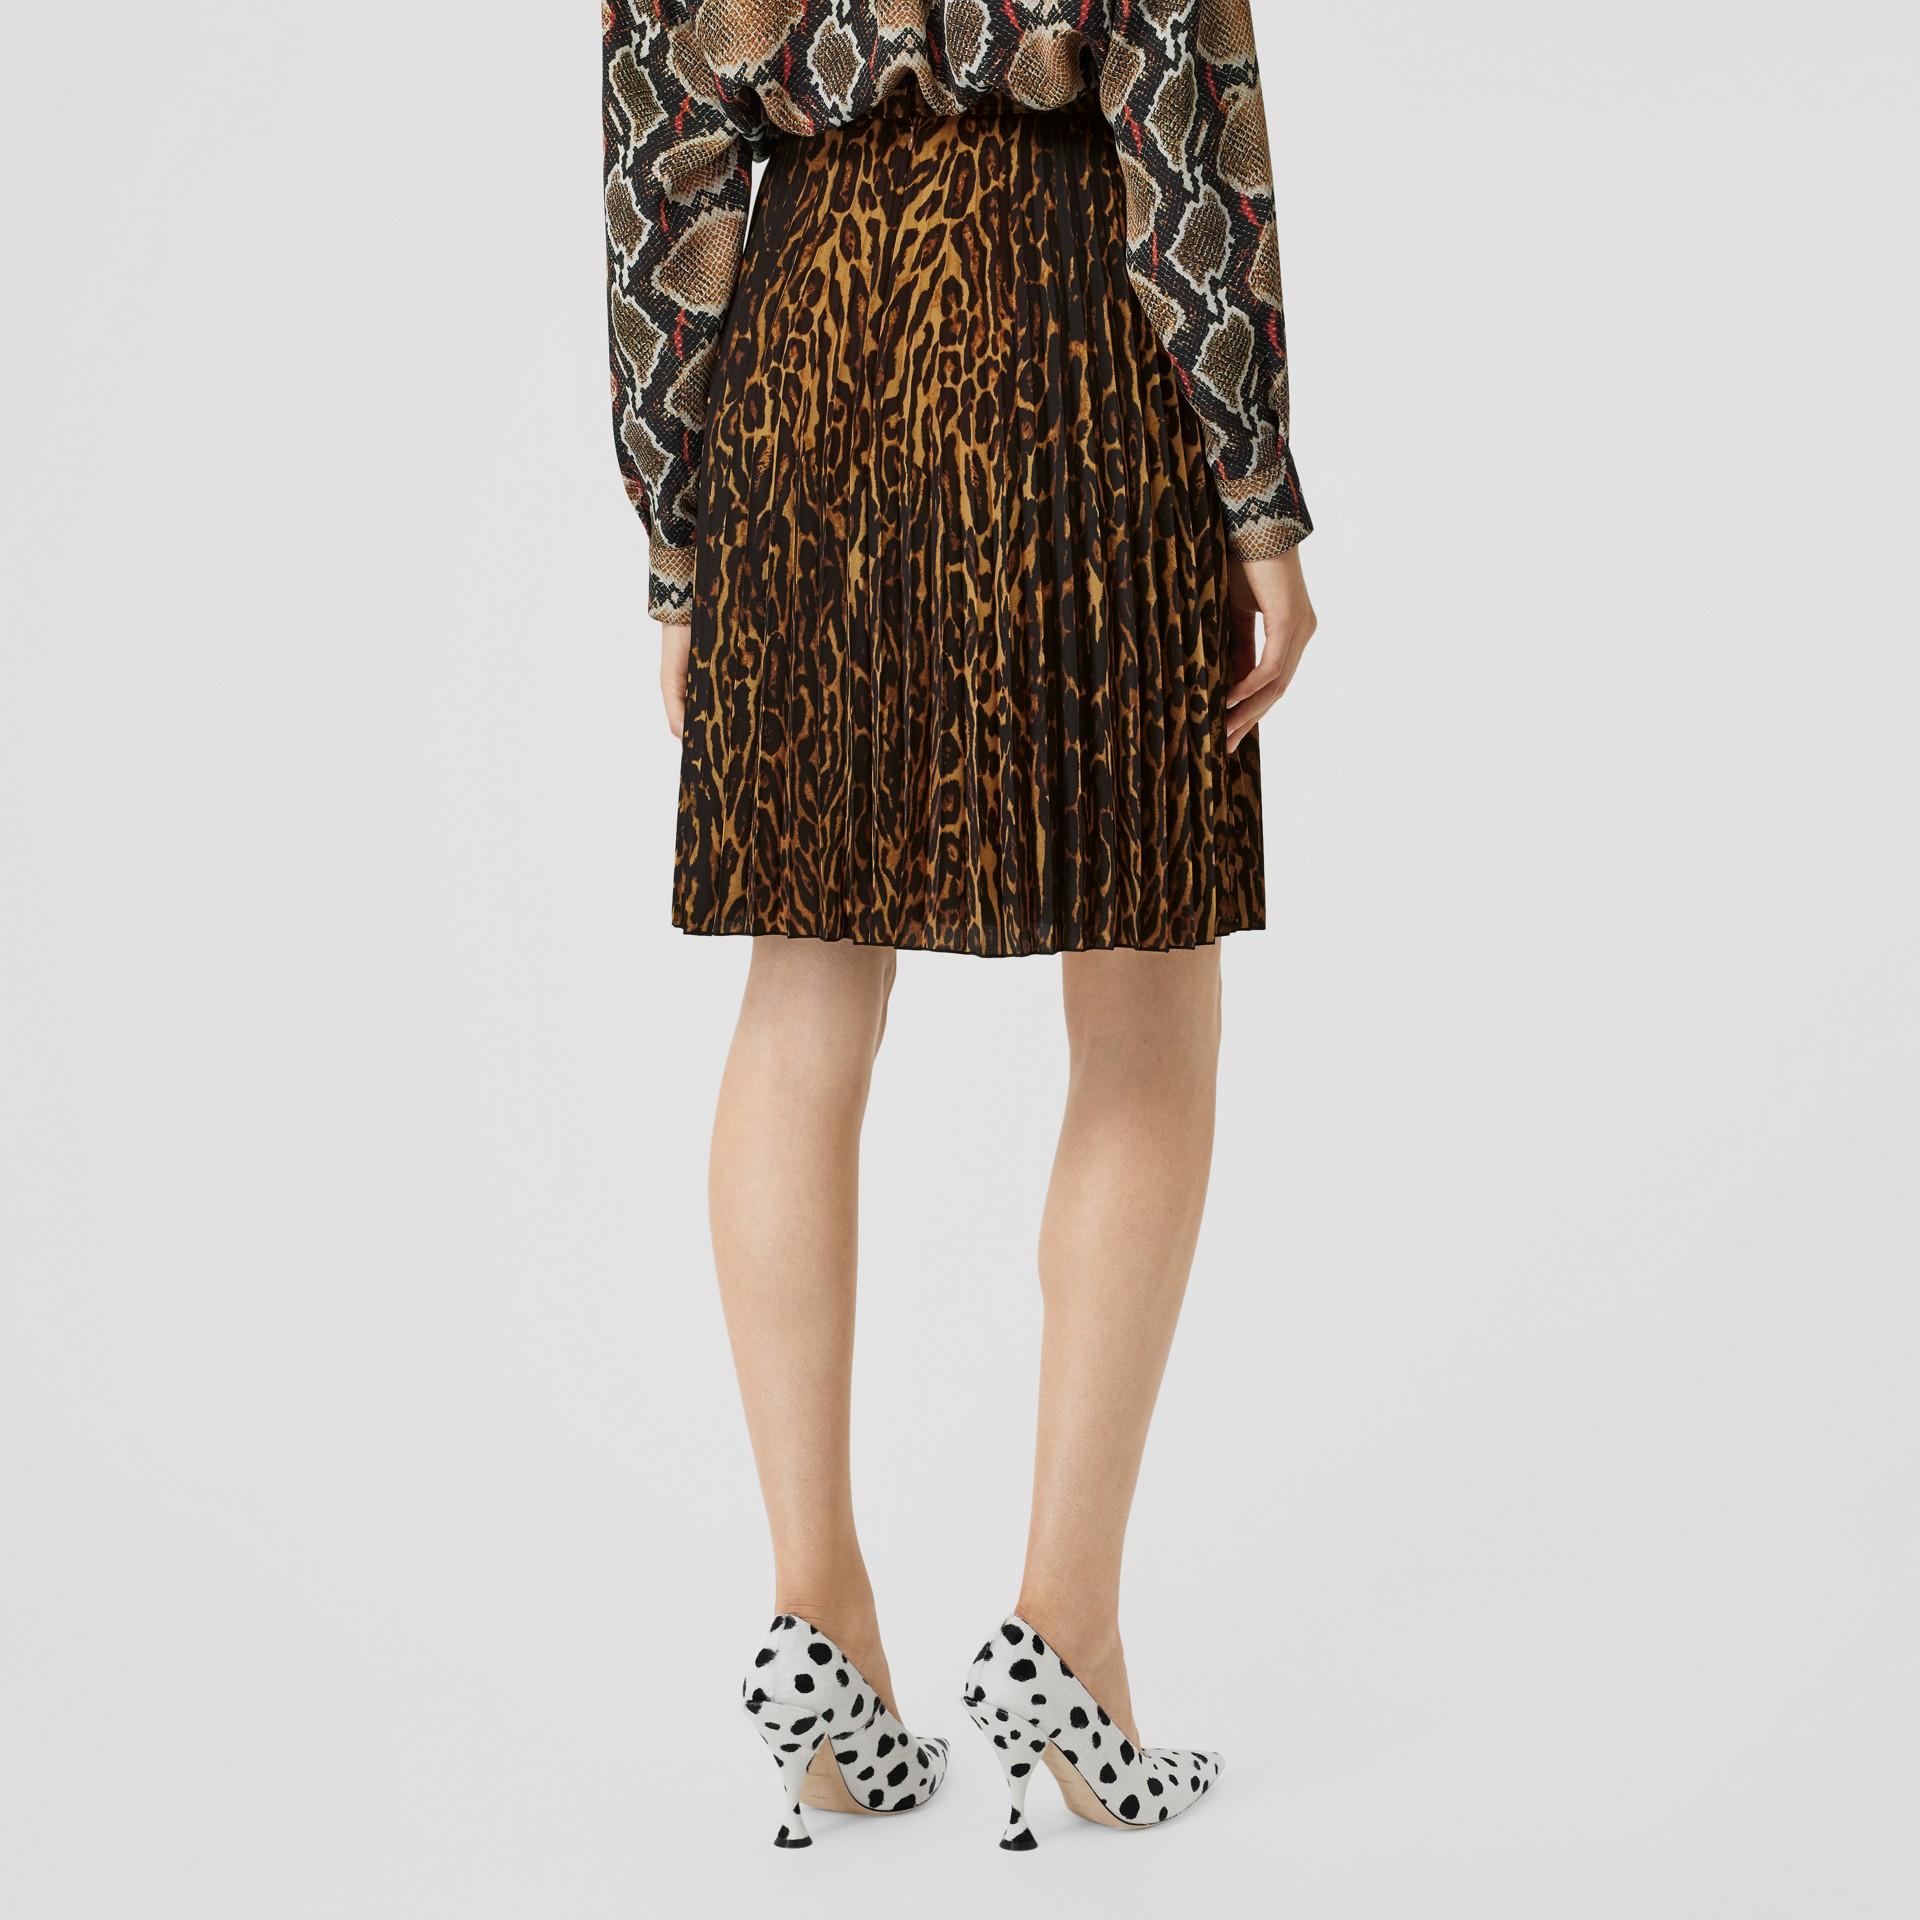 Leopard Print Pleated Skirt in Dark Mustard - Women | Burberry Hong Kong S.A.R - gallery image 2